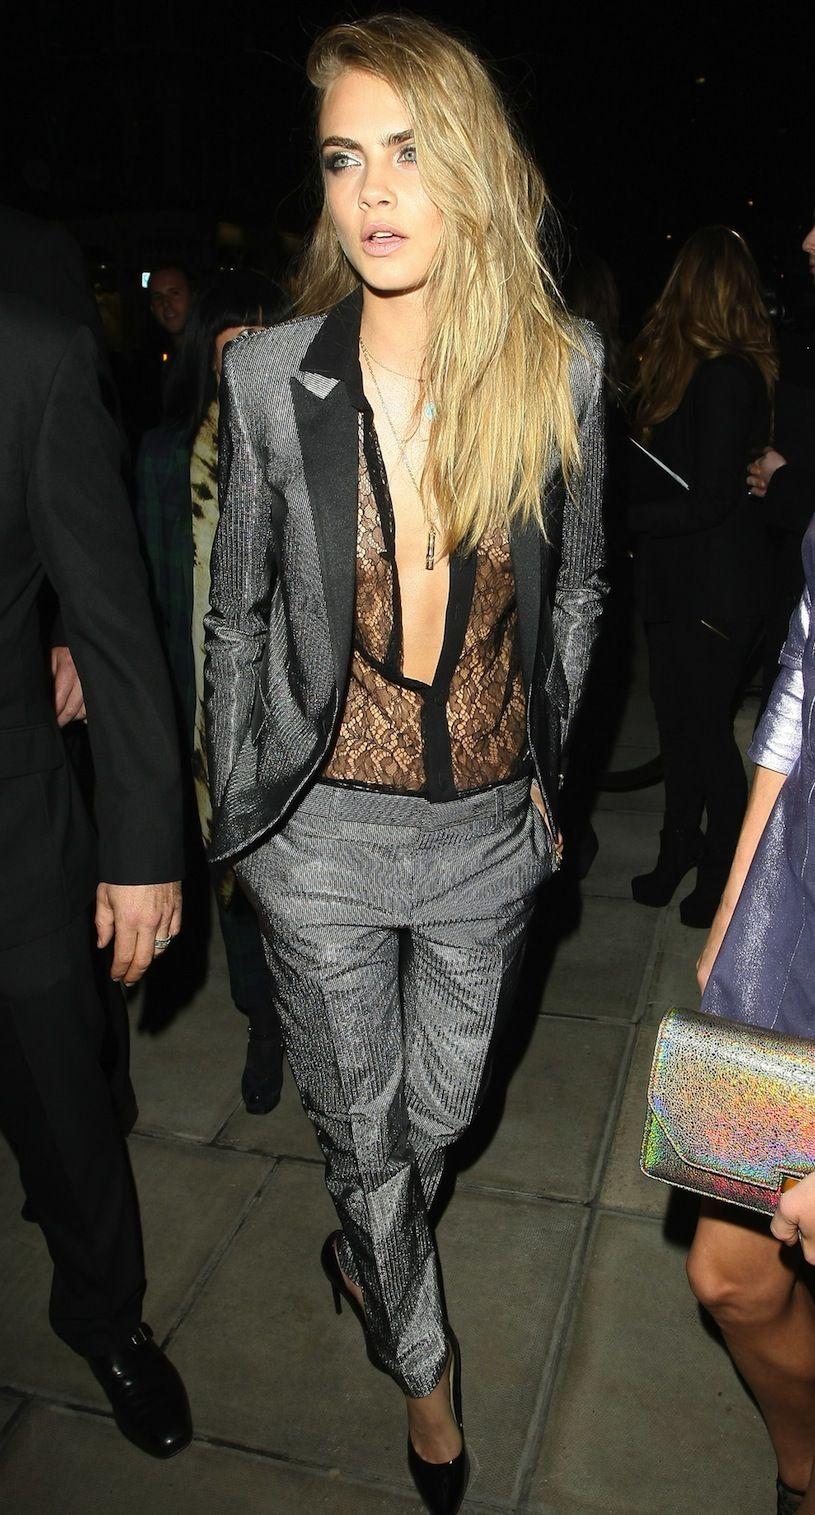 ea8e5b933 Cara Delevingne tuxedo suit lace blouse   New Years Eve Inspiration ...